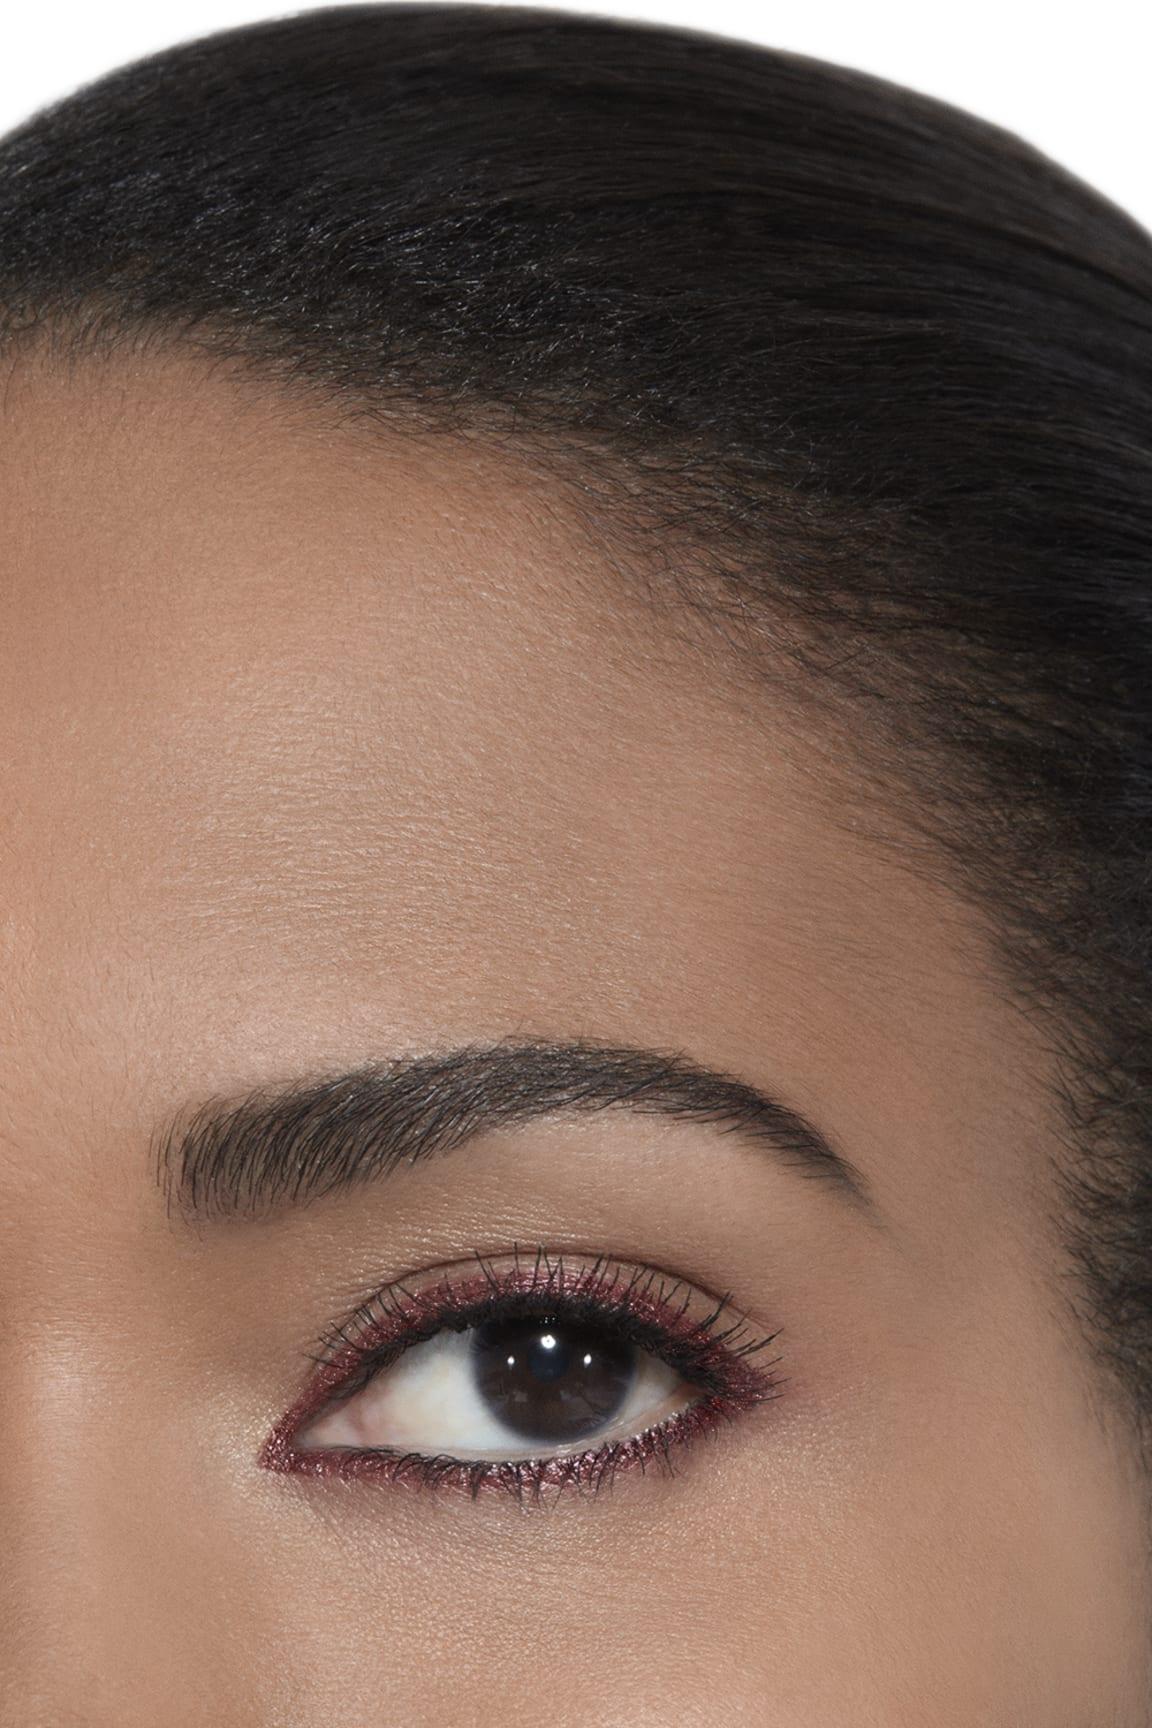 Anwendung Make-up-Bild 2 - STYLO YEUX WATERPROOF 54 - ROSE CUIVRÉ